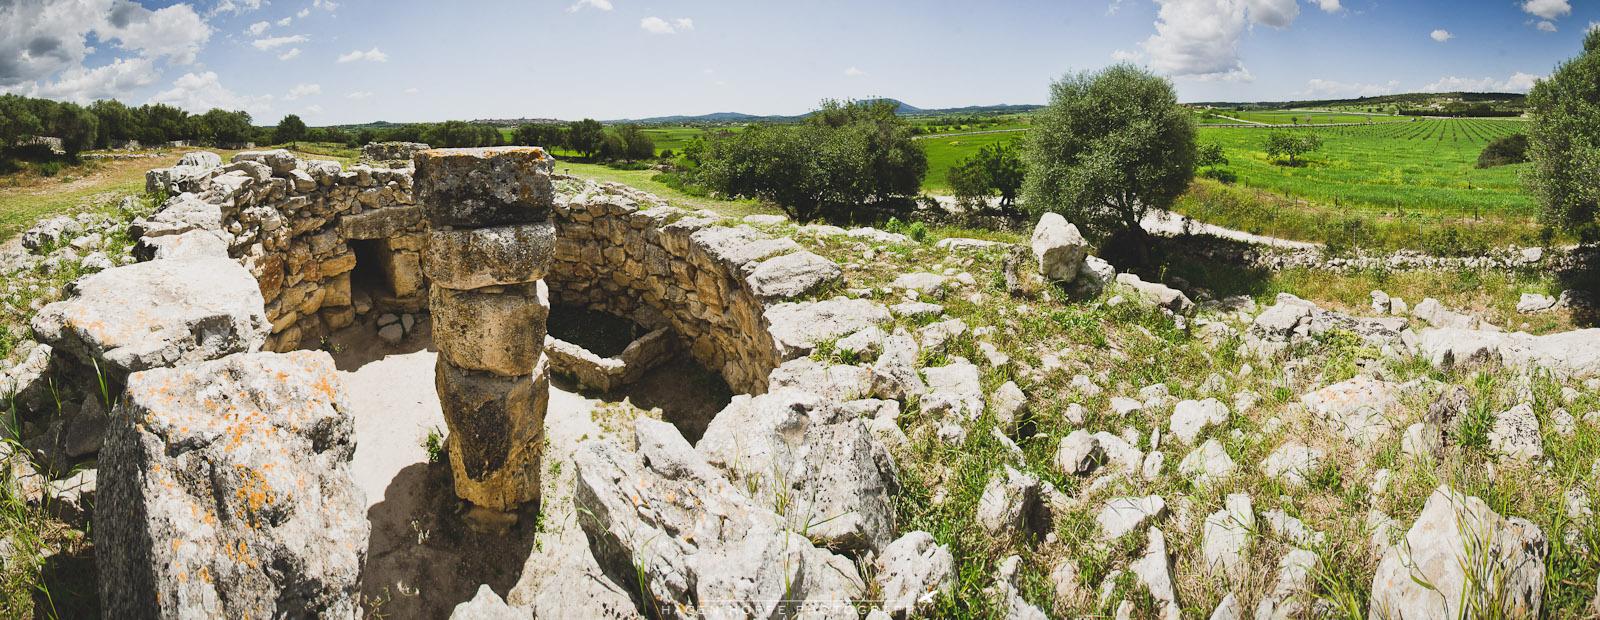 2014-04-22_hagen-hoppe-fotografie_travel_mallorca_panorama_C